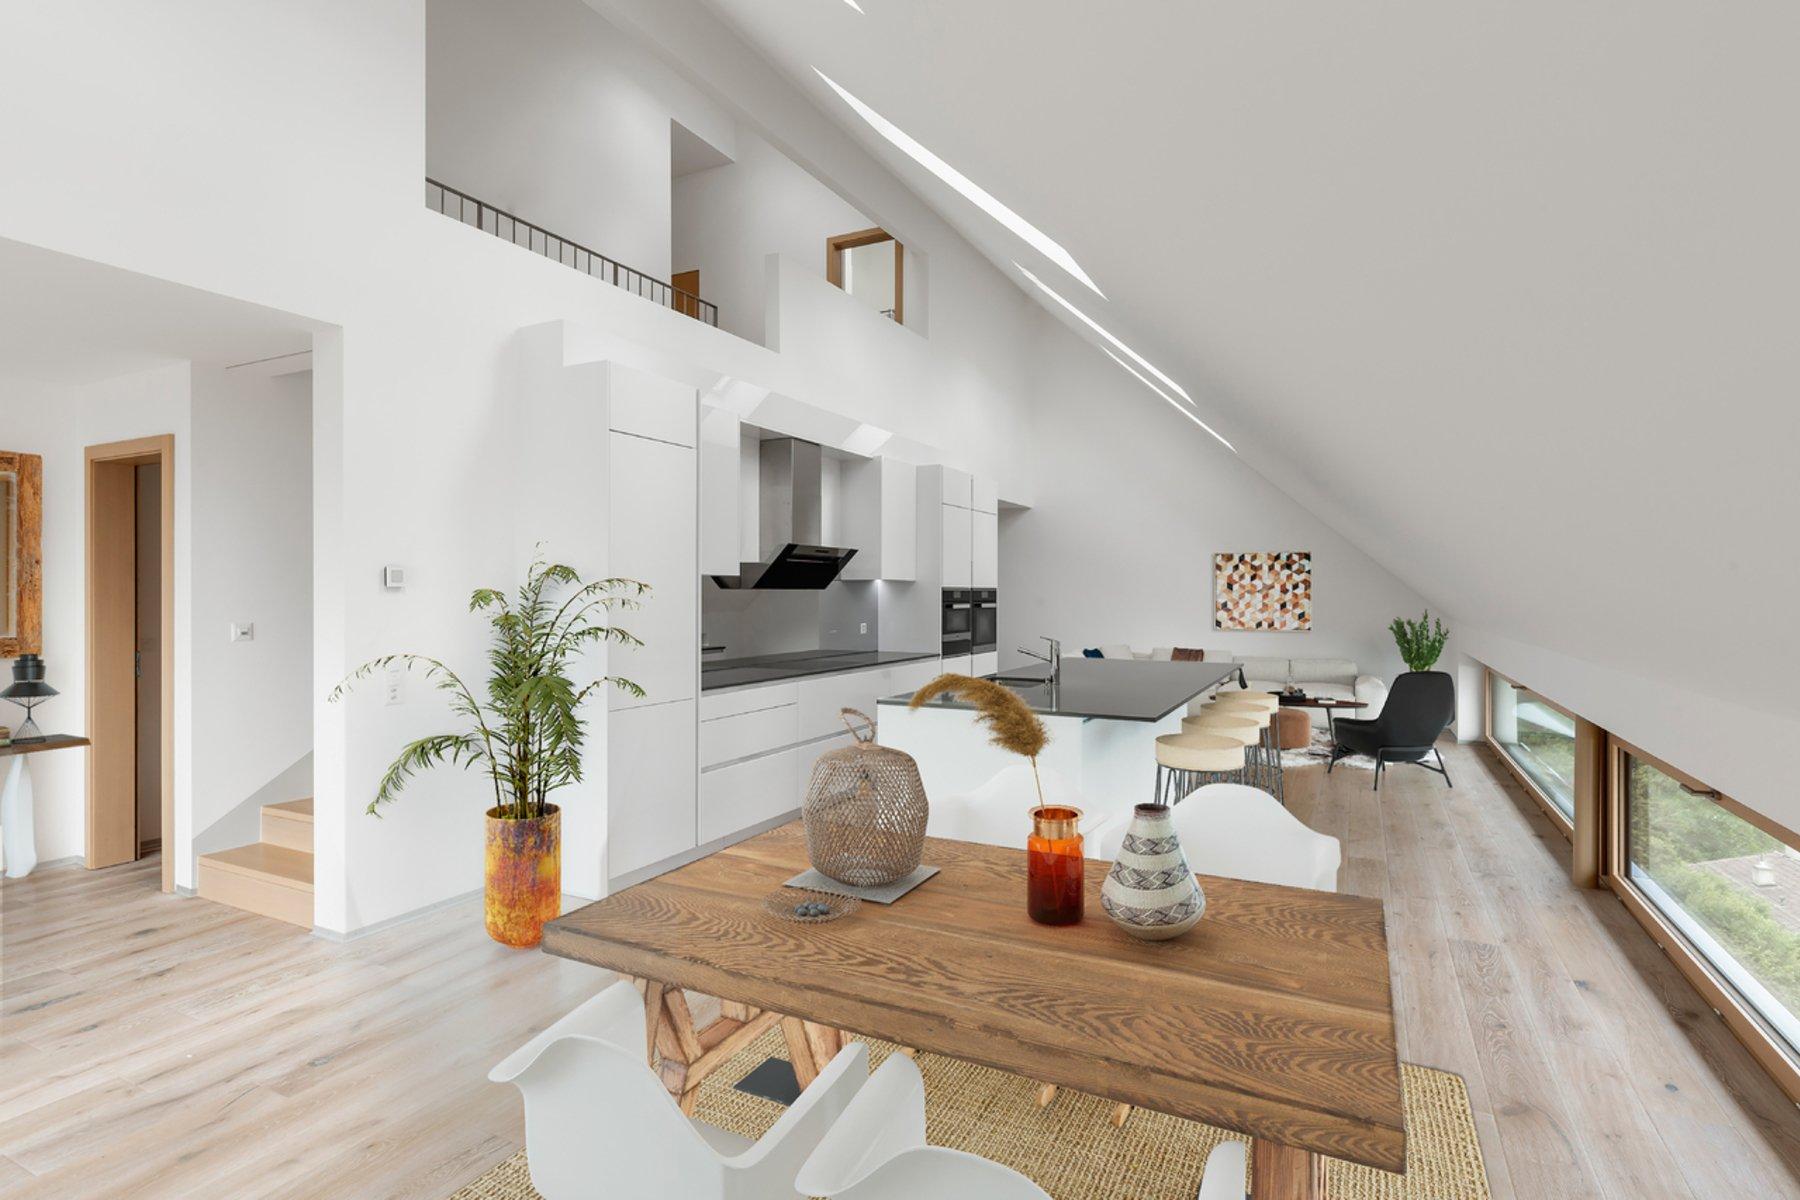 Apartment in Chardonne, Vaud, Switzerland 1